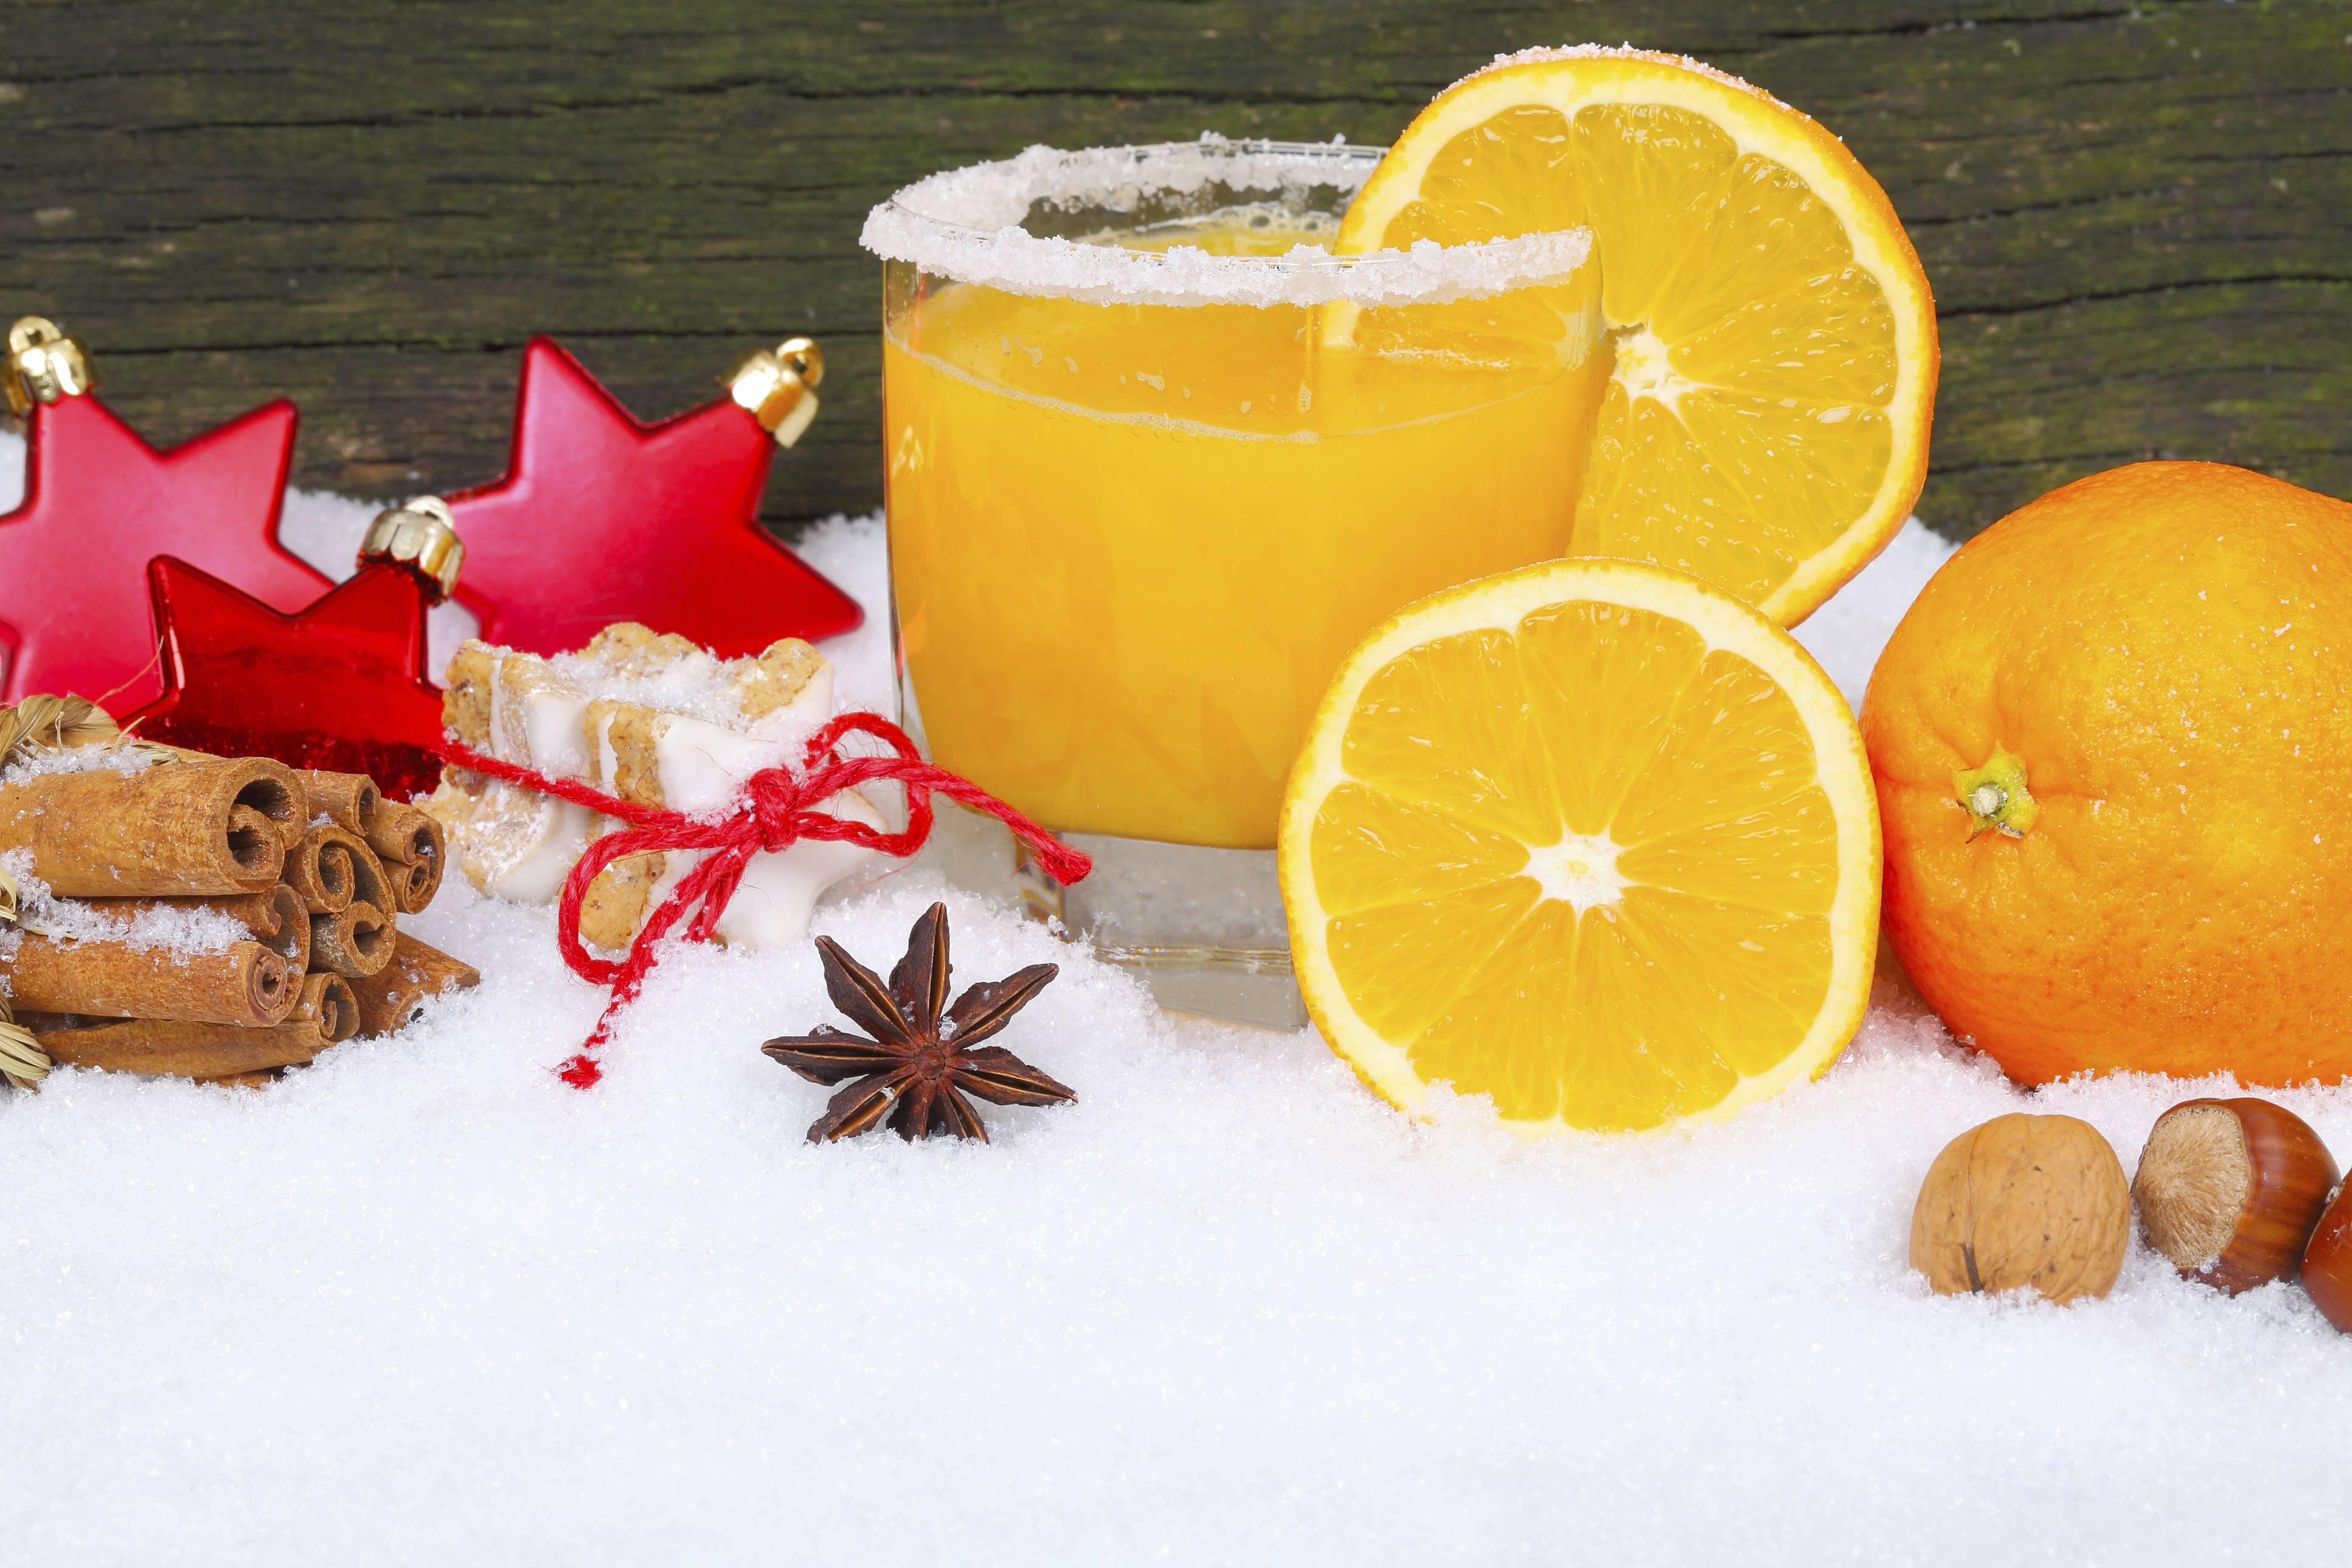 Dieta Depurativa per Prepararsi al Natale